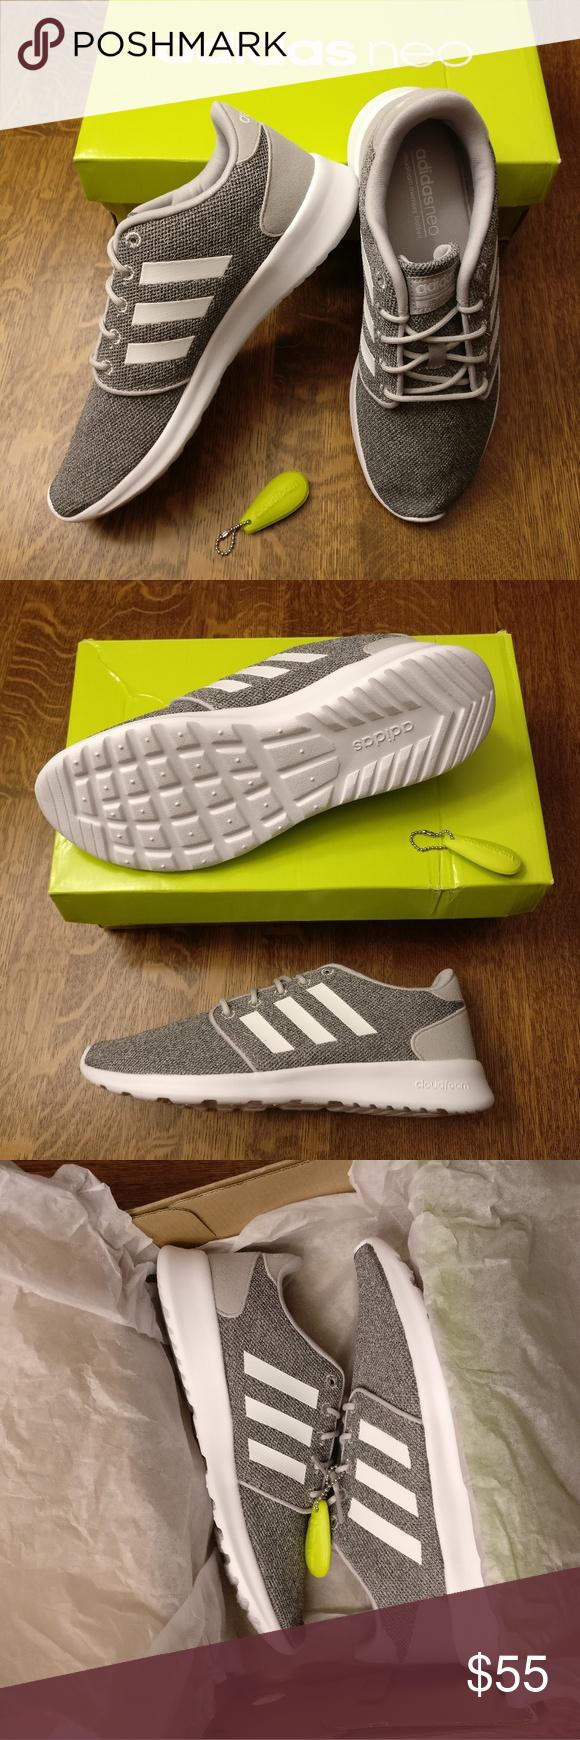 Adidas Neo Cloudfoam Racer Athleisure Tendenza Delle Scarpe Da Ginnastica, Tessuto